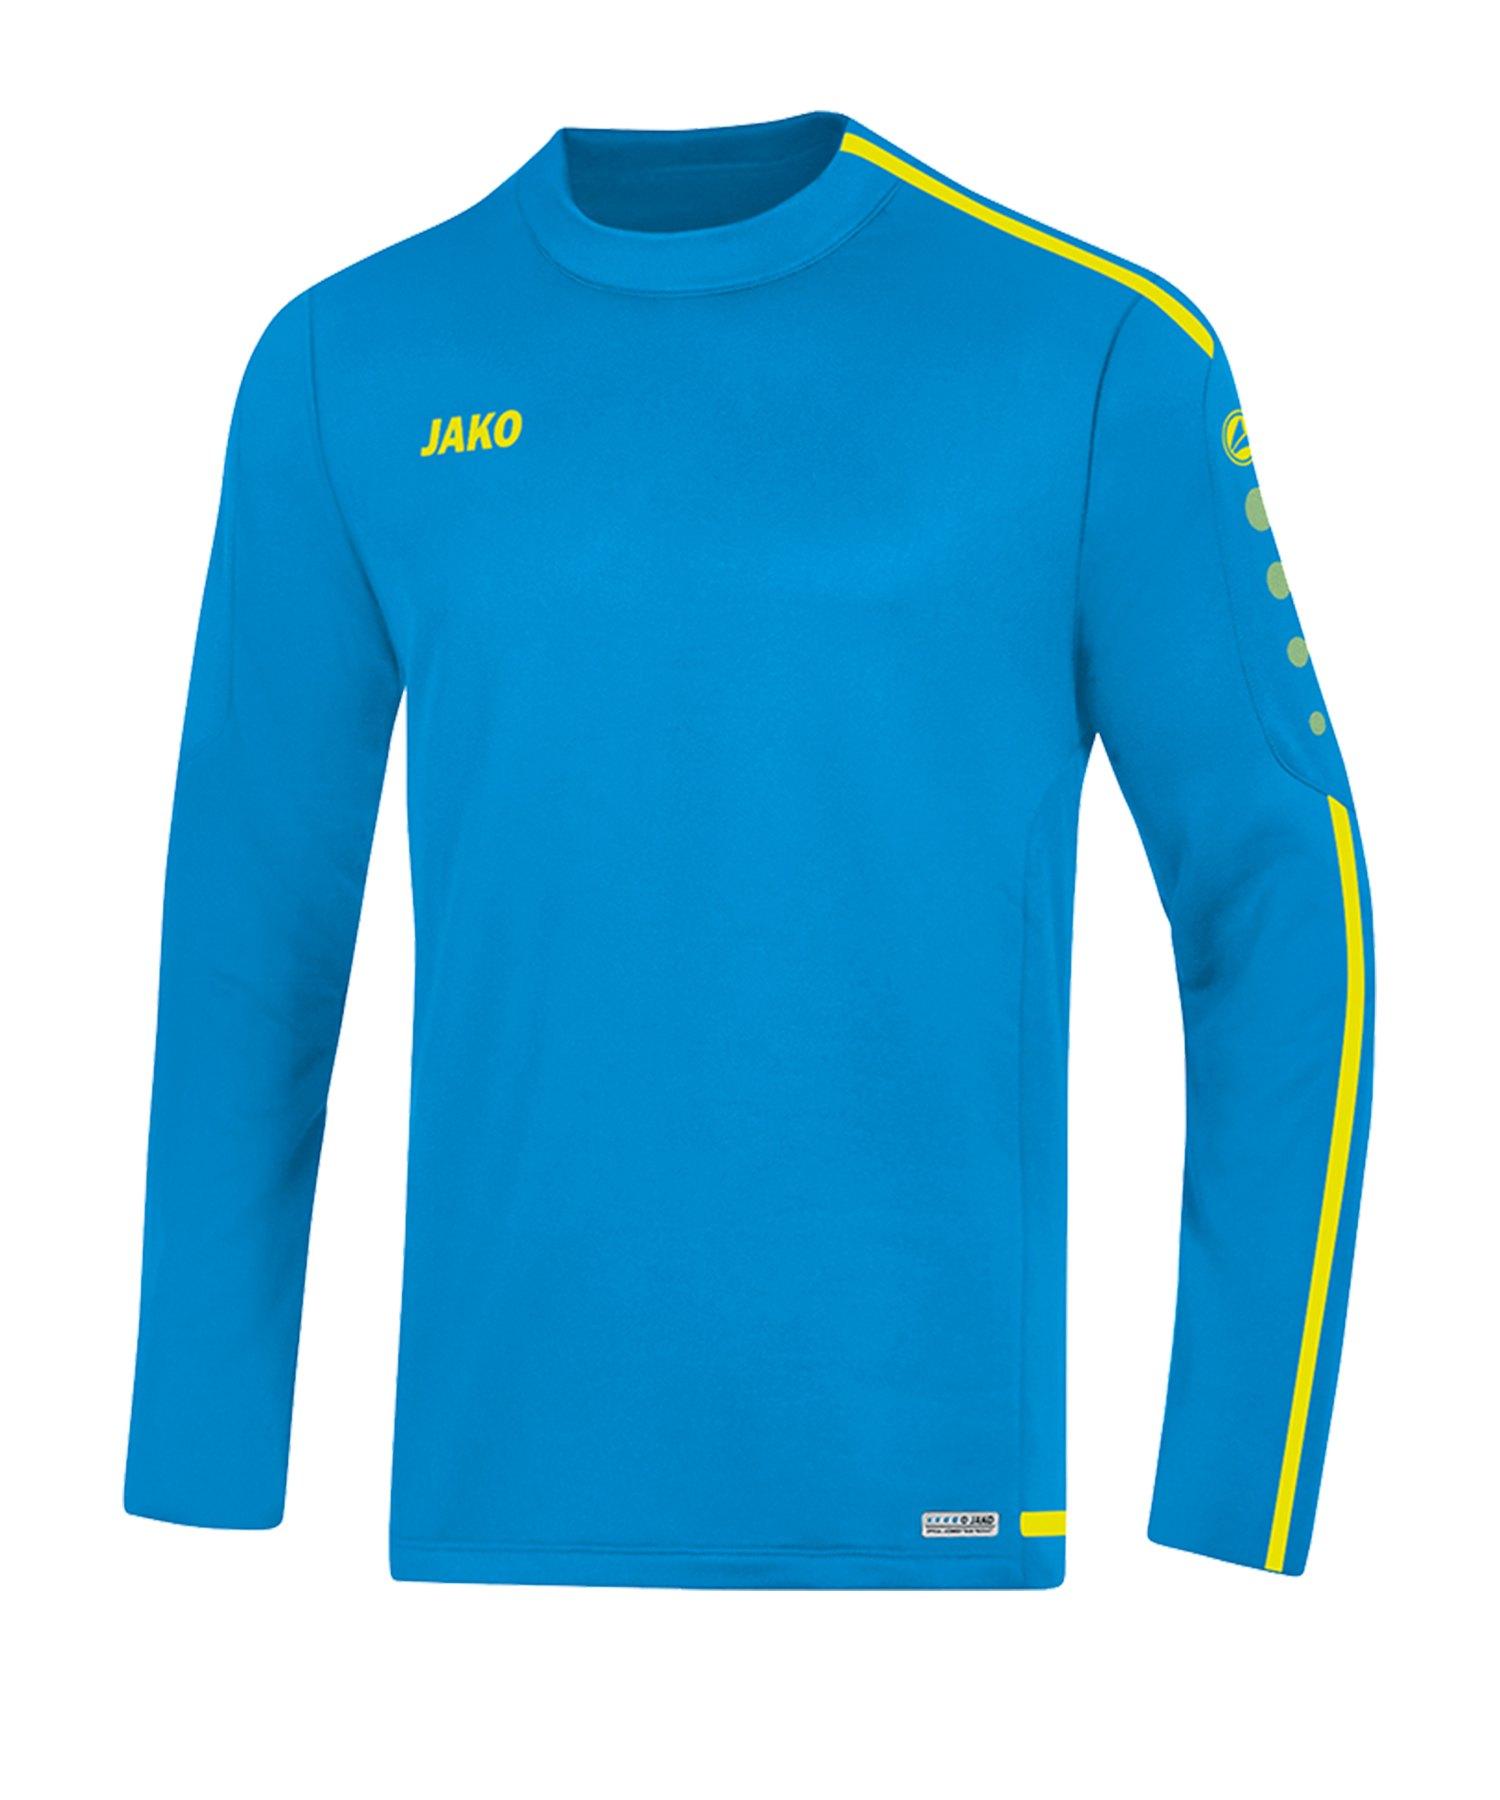 Jako Striker 2.0 Sweatshirt Kids Blau Gelb F89 - Blau